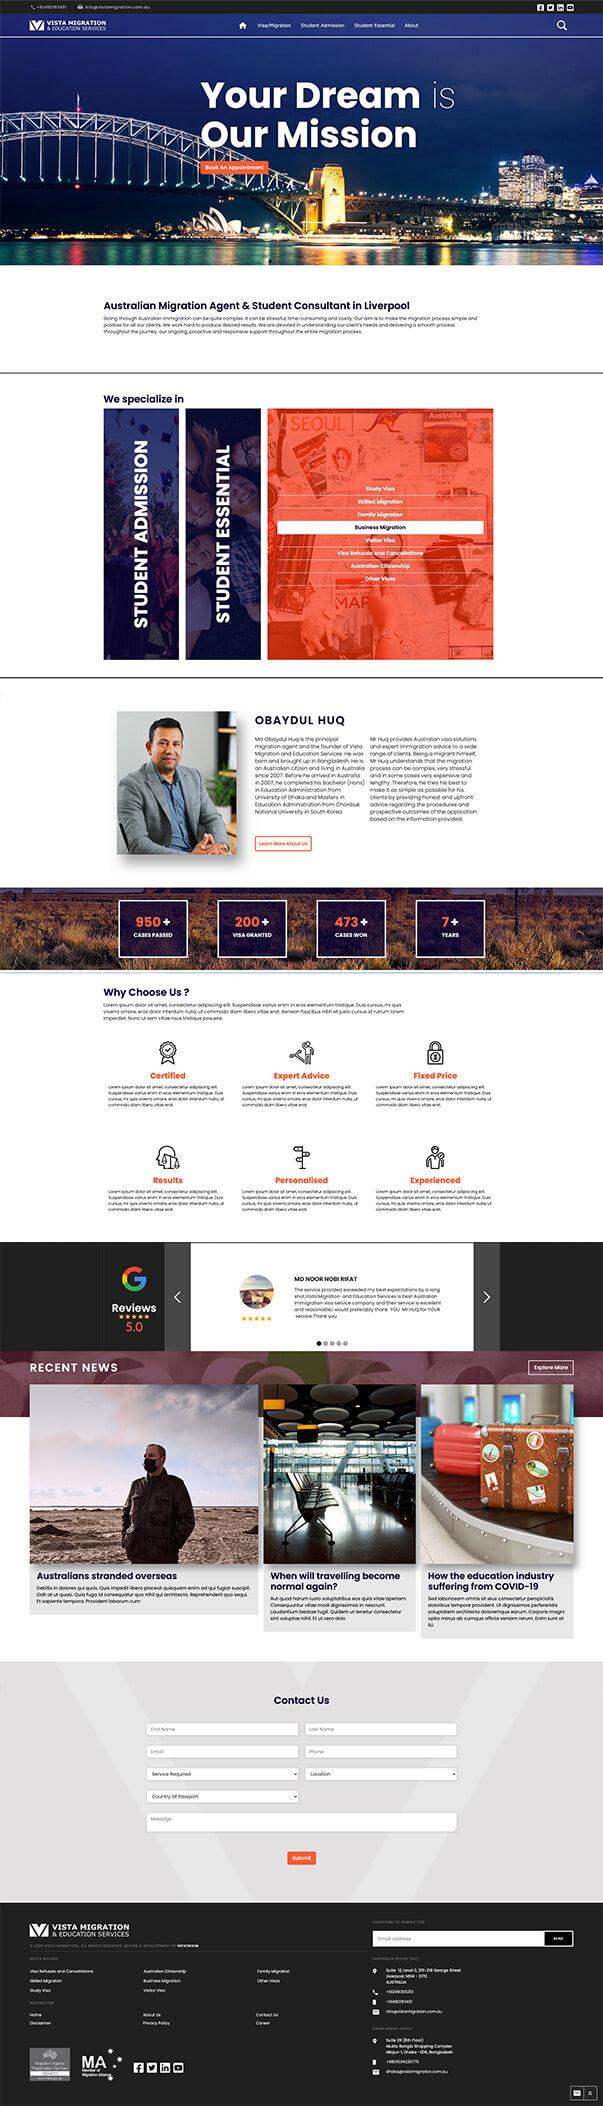 Web design of Vista Migration and Education Services.